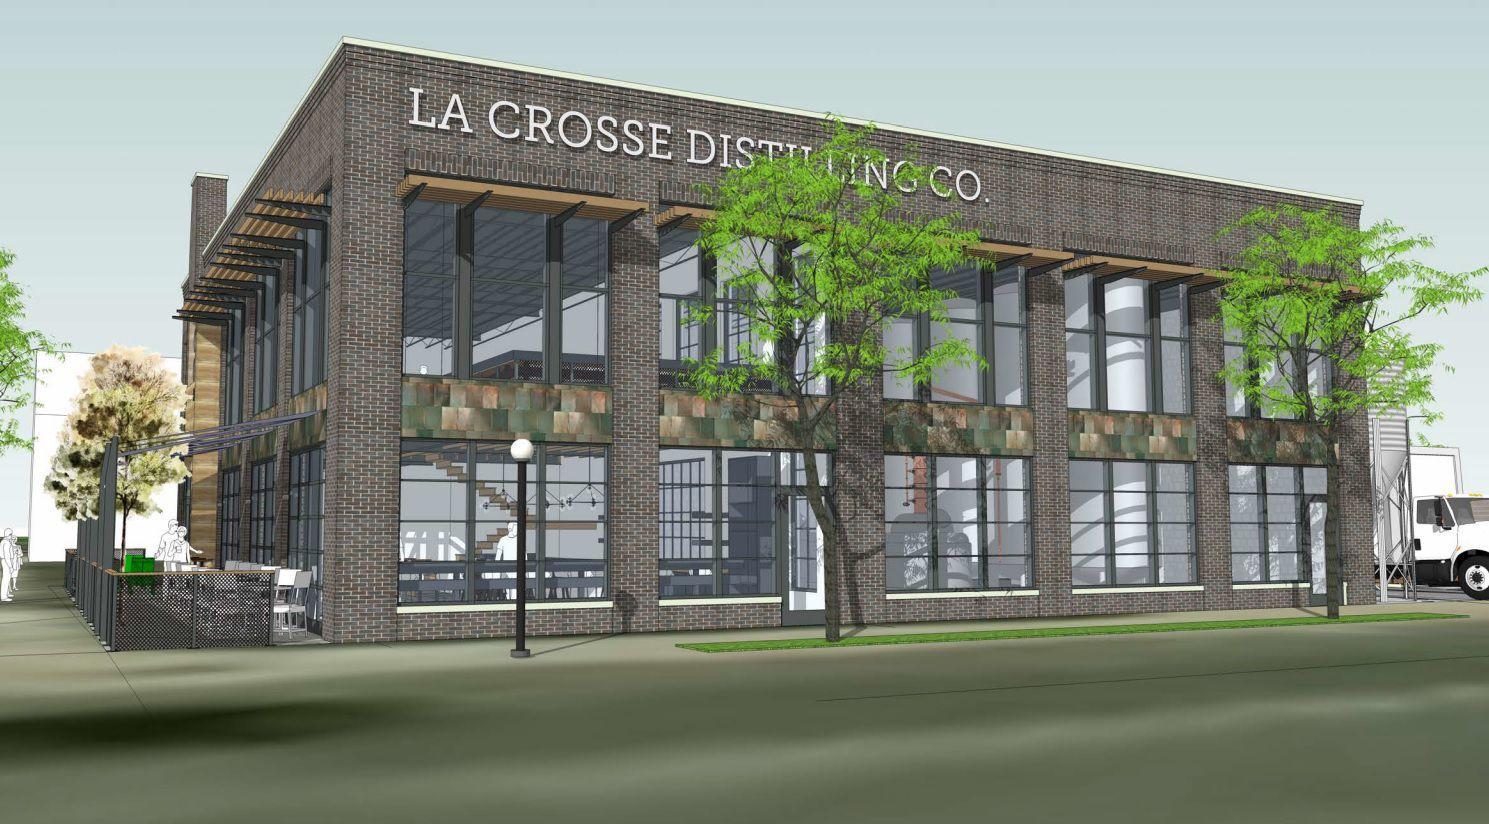 La Crosse Distilling Co craft distillery planned